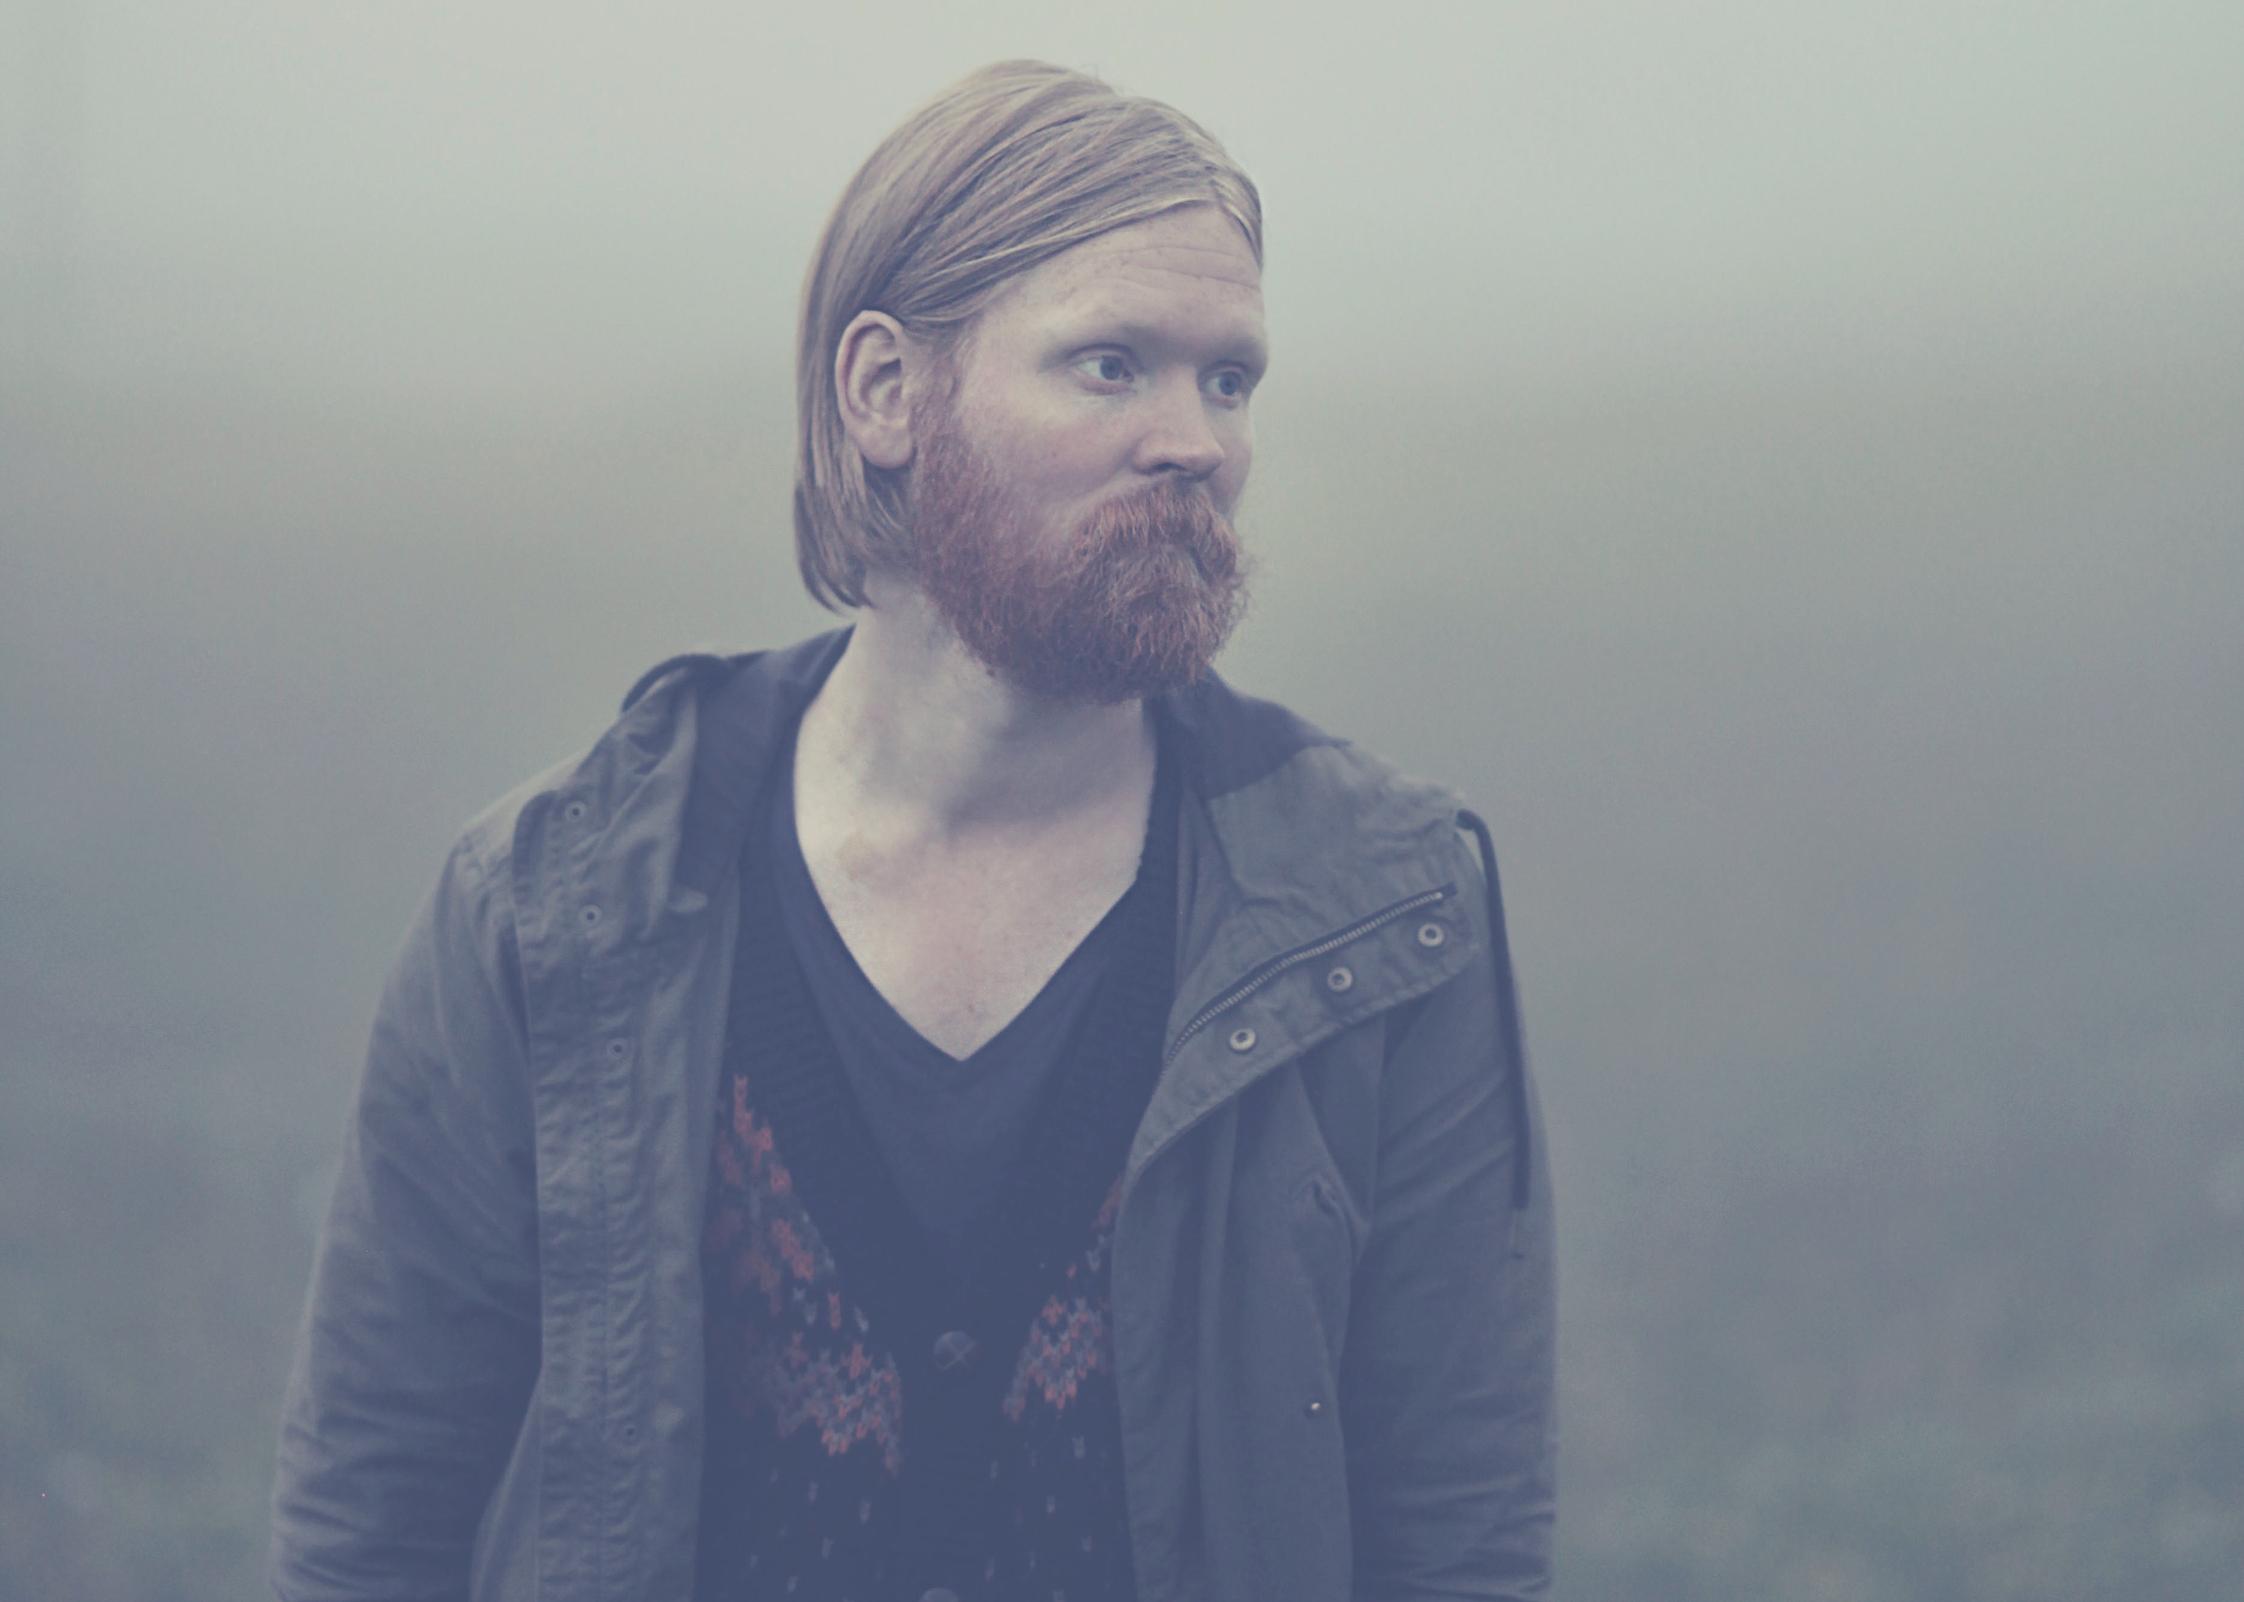 PREMIERE: Júníus Meyvant – Neon Experience (Live from Vatnagarðar)